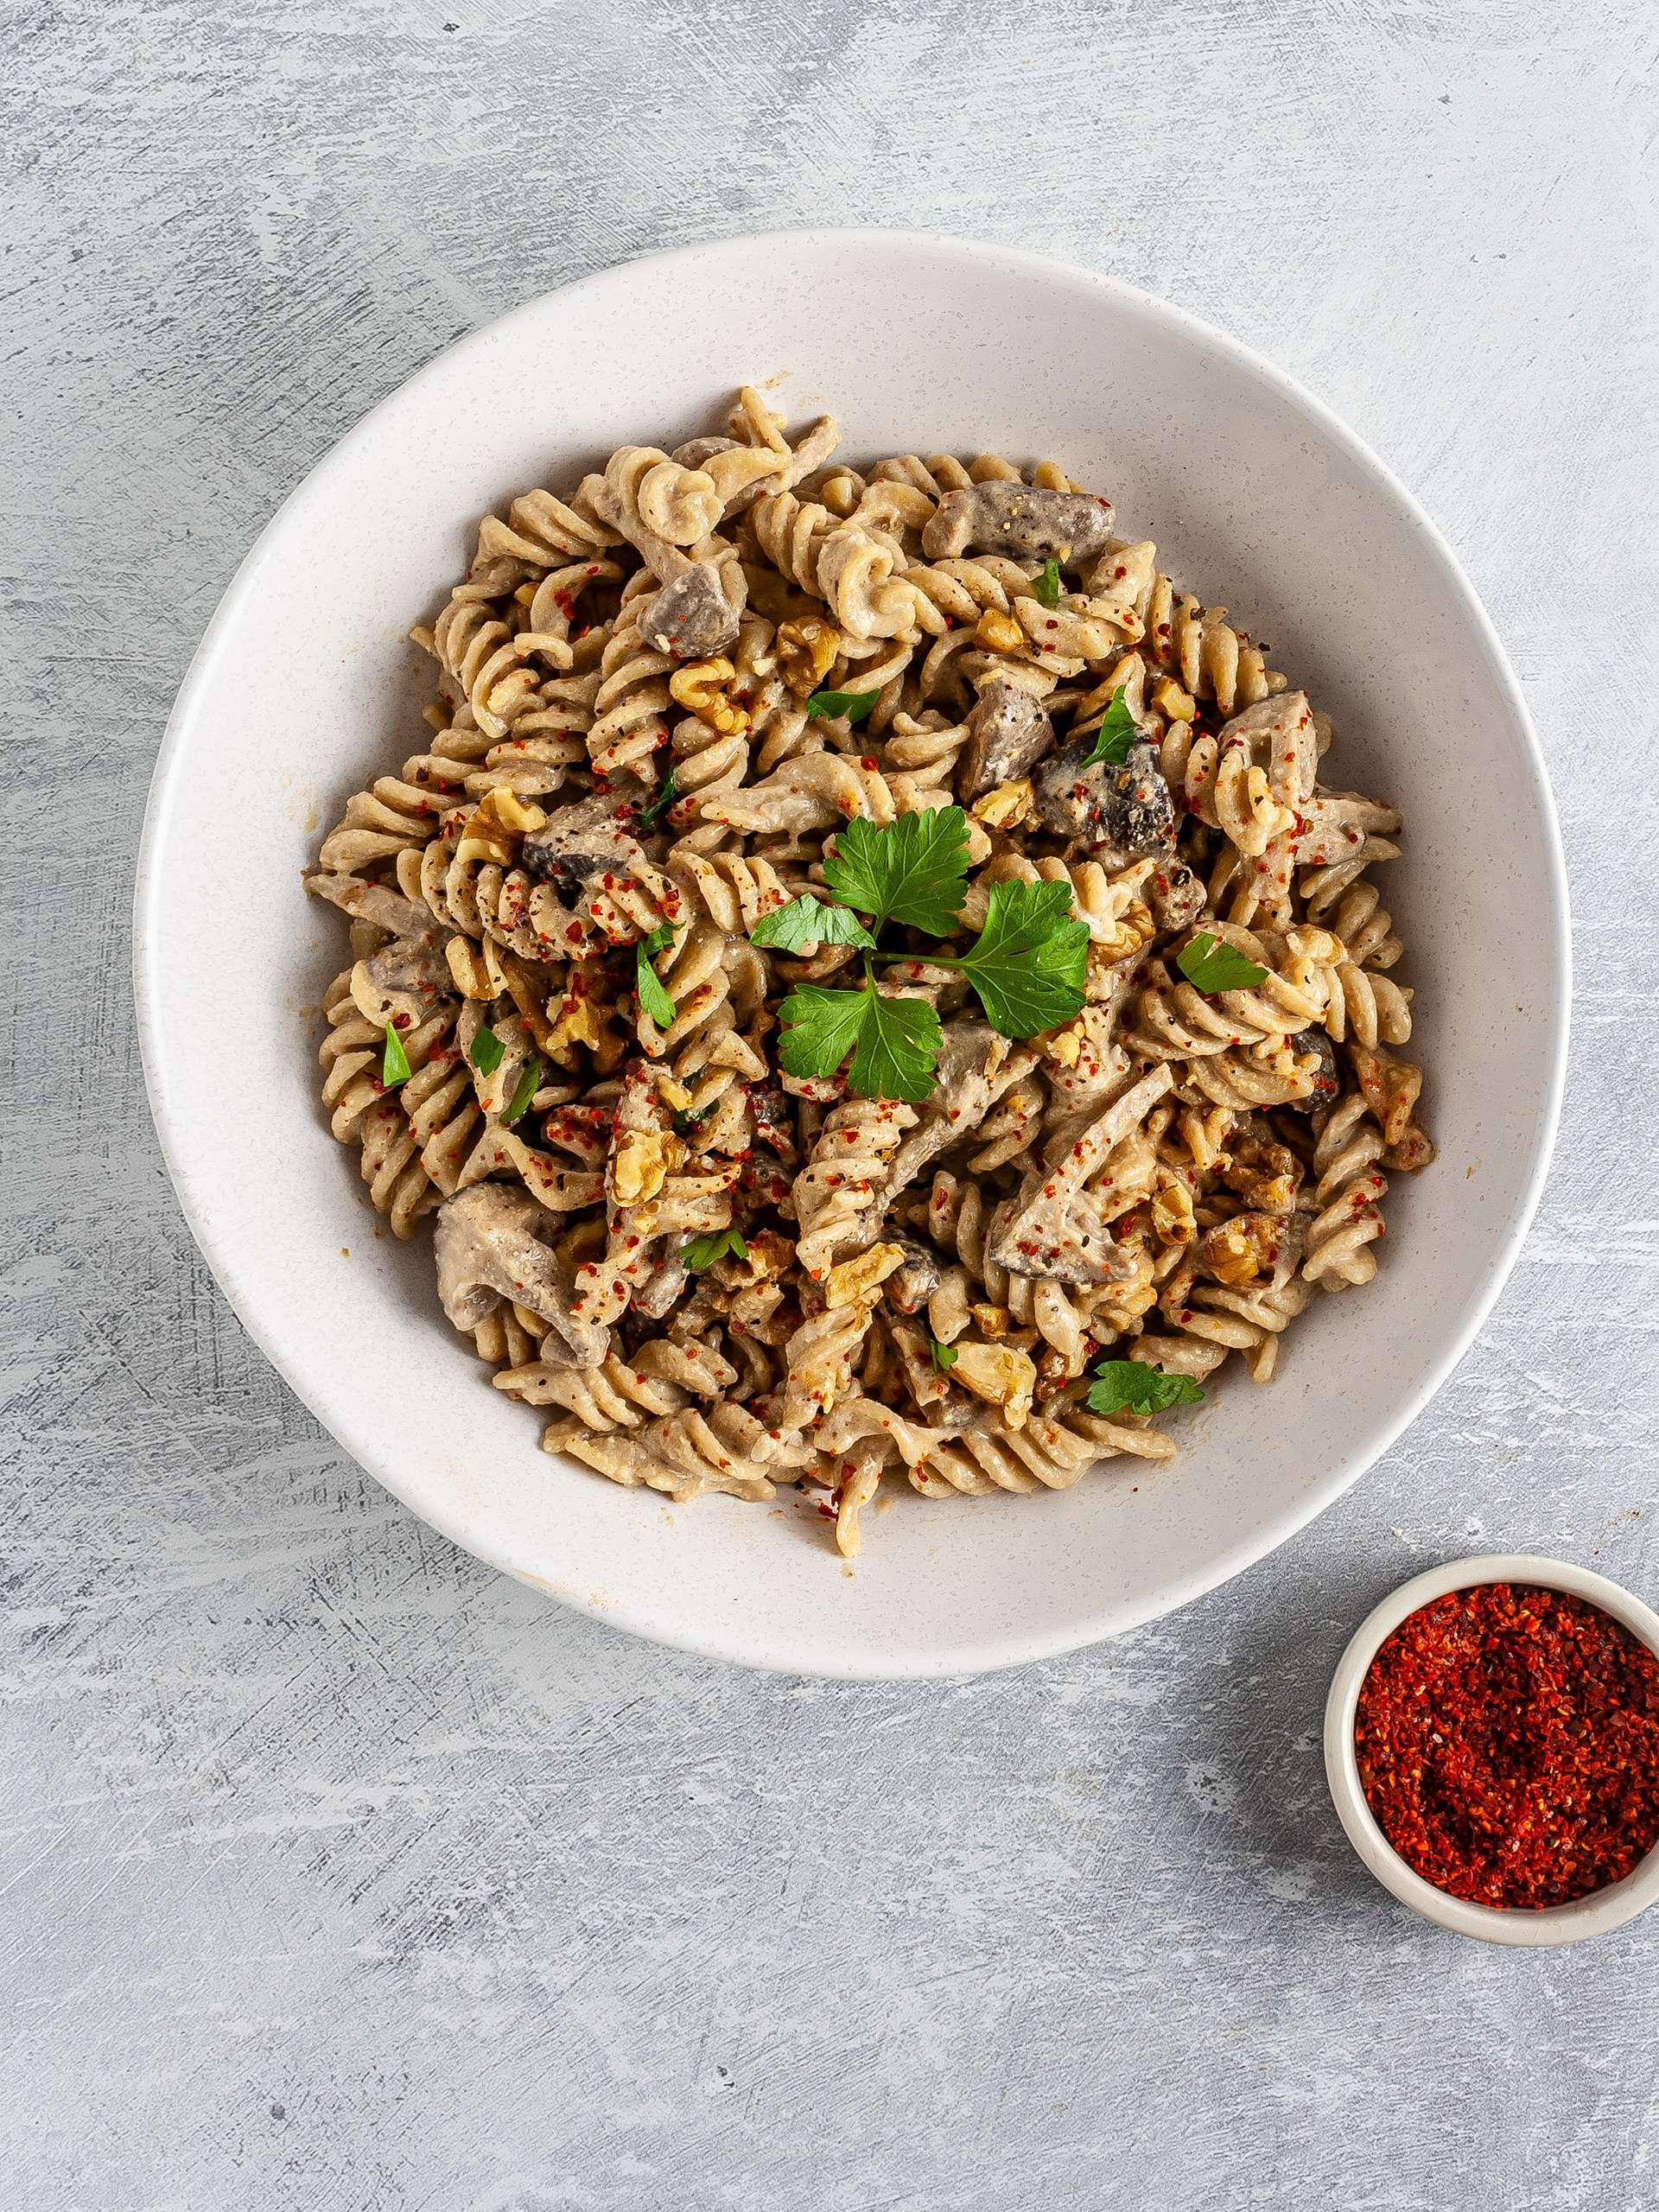 Mushroom tahini pasta with chillies, walnuts, and parsley